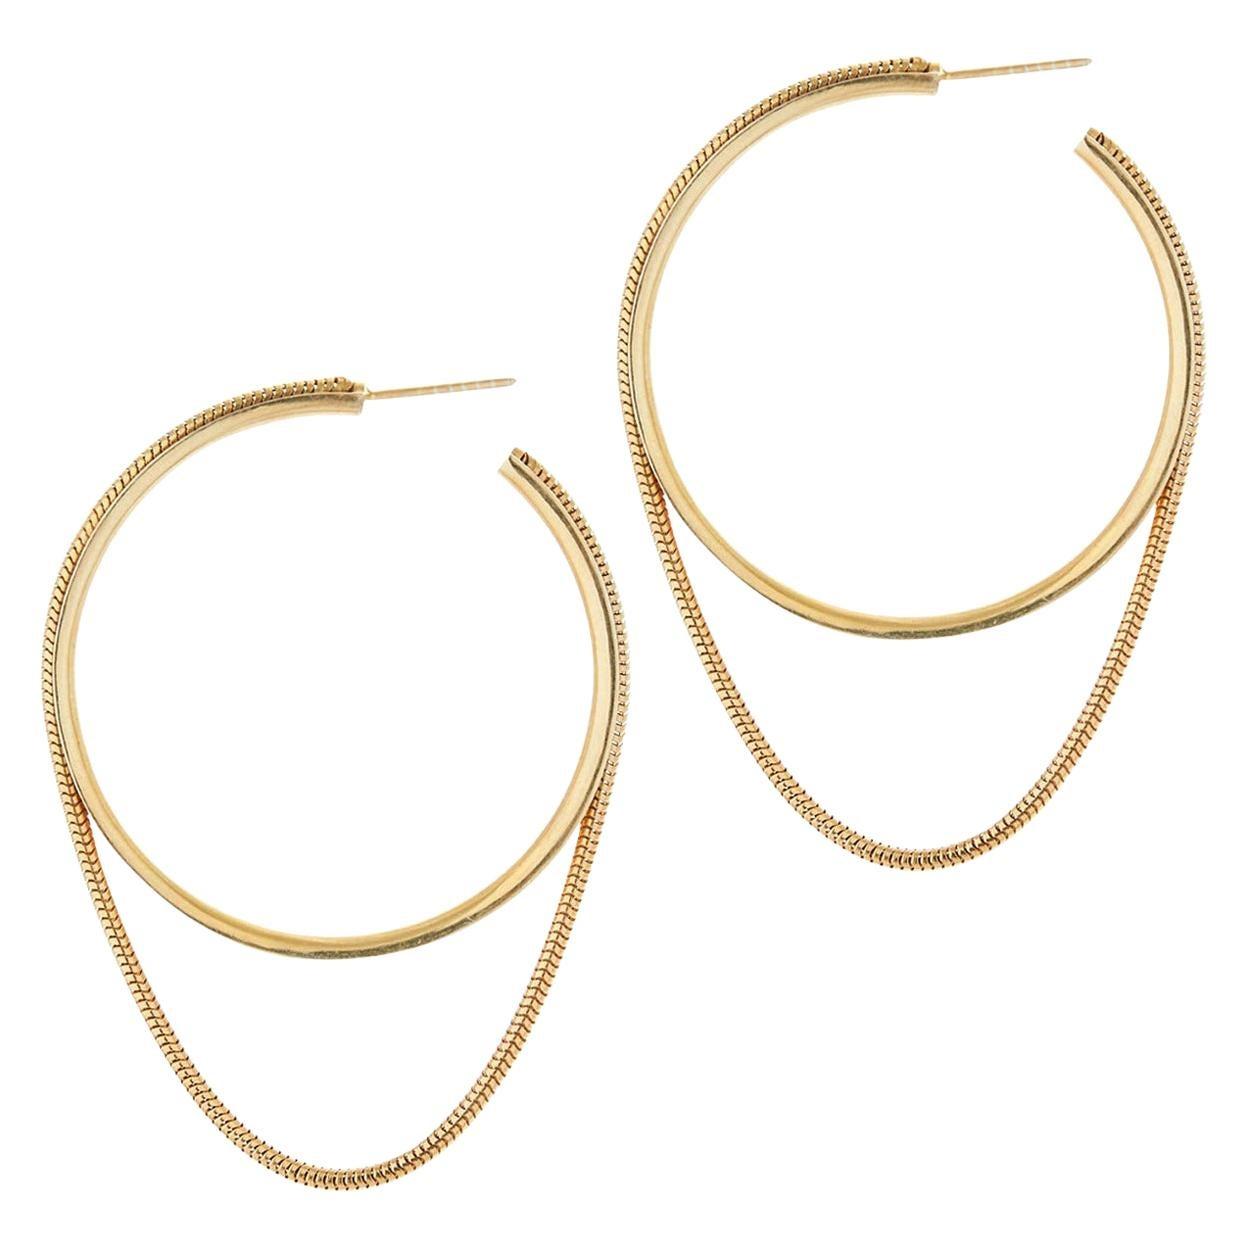 Earrings Hoops Minimal Large Snake Chain 18K Gold-Plated Silver Greek Earrings